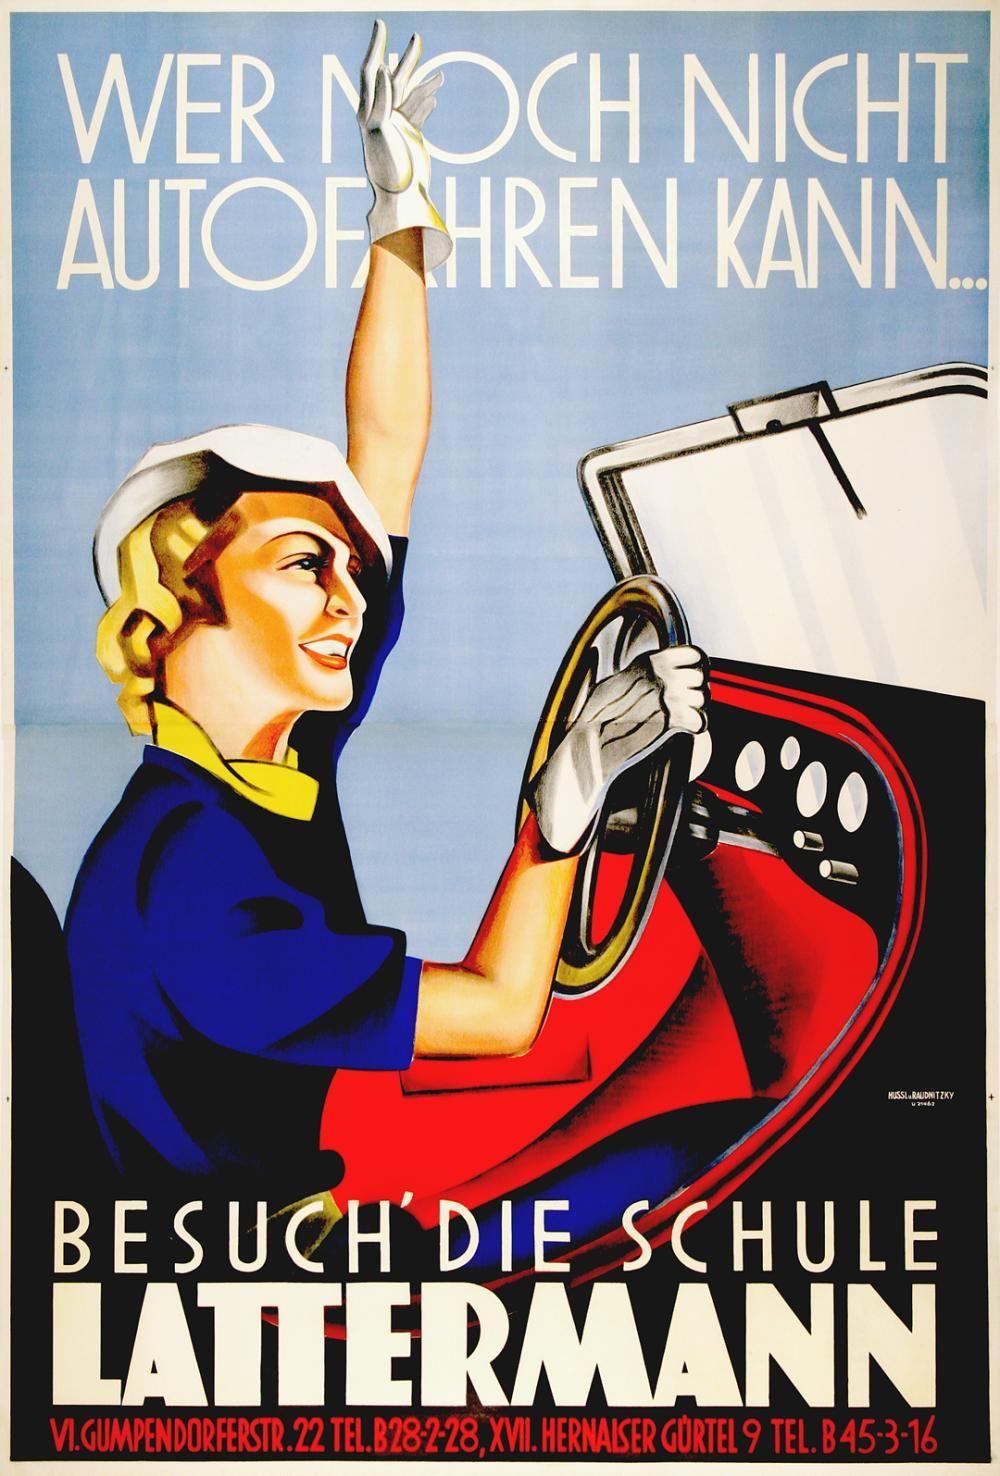 Latterman original austrian driving school poster c1936 by